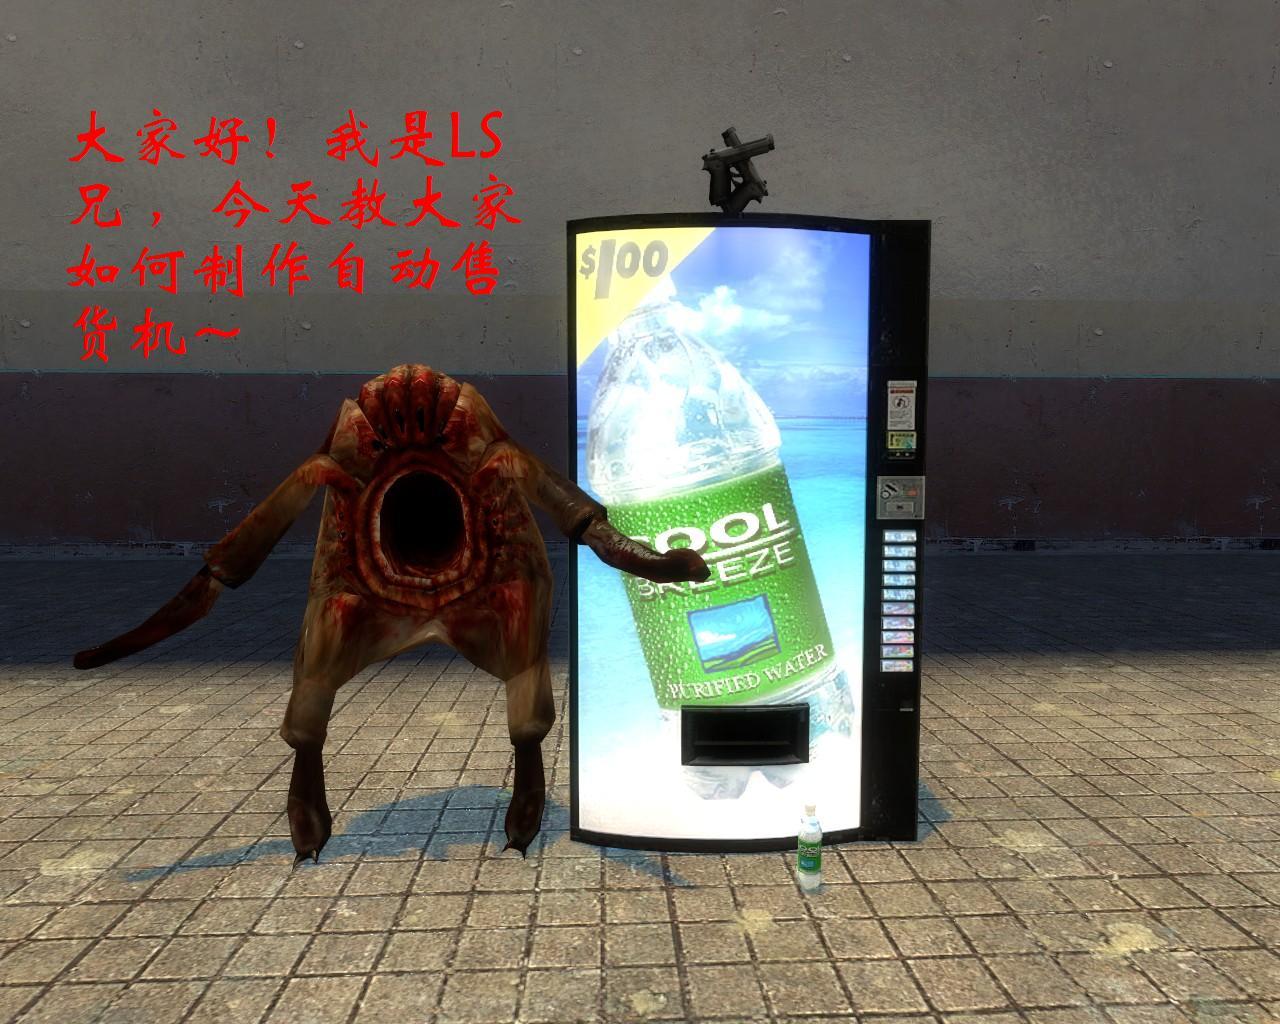 【gmod教程】 教你如何制作自动售货机